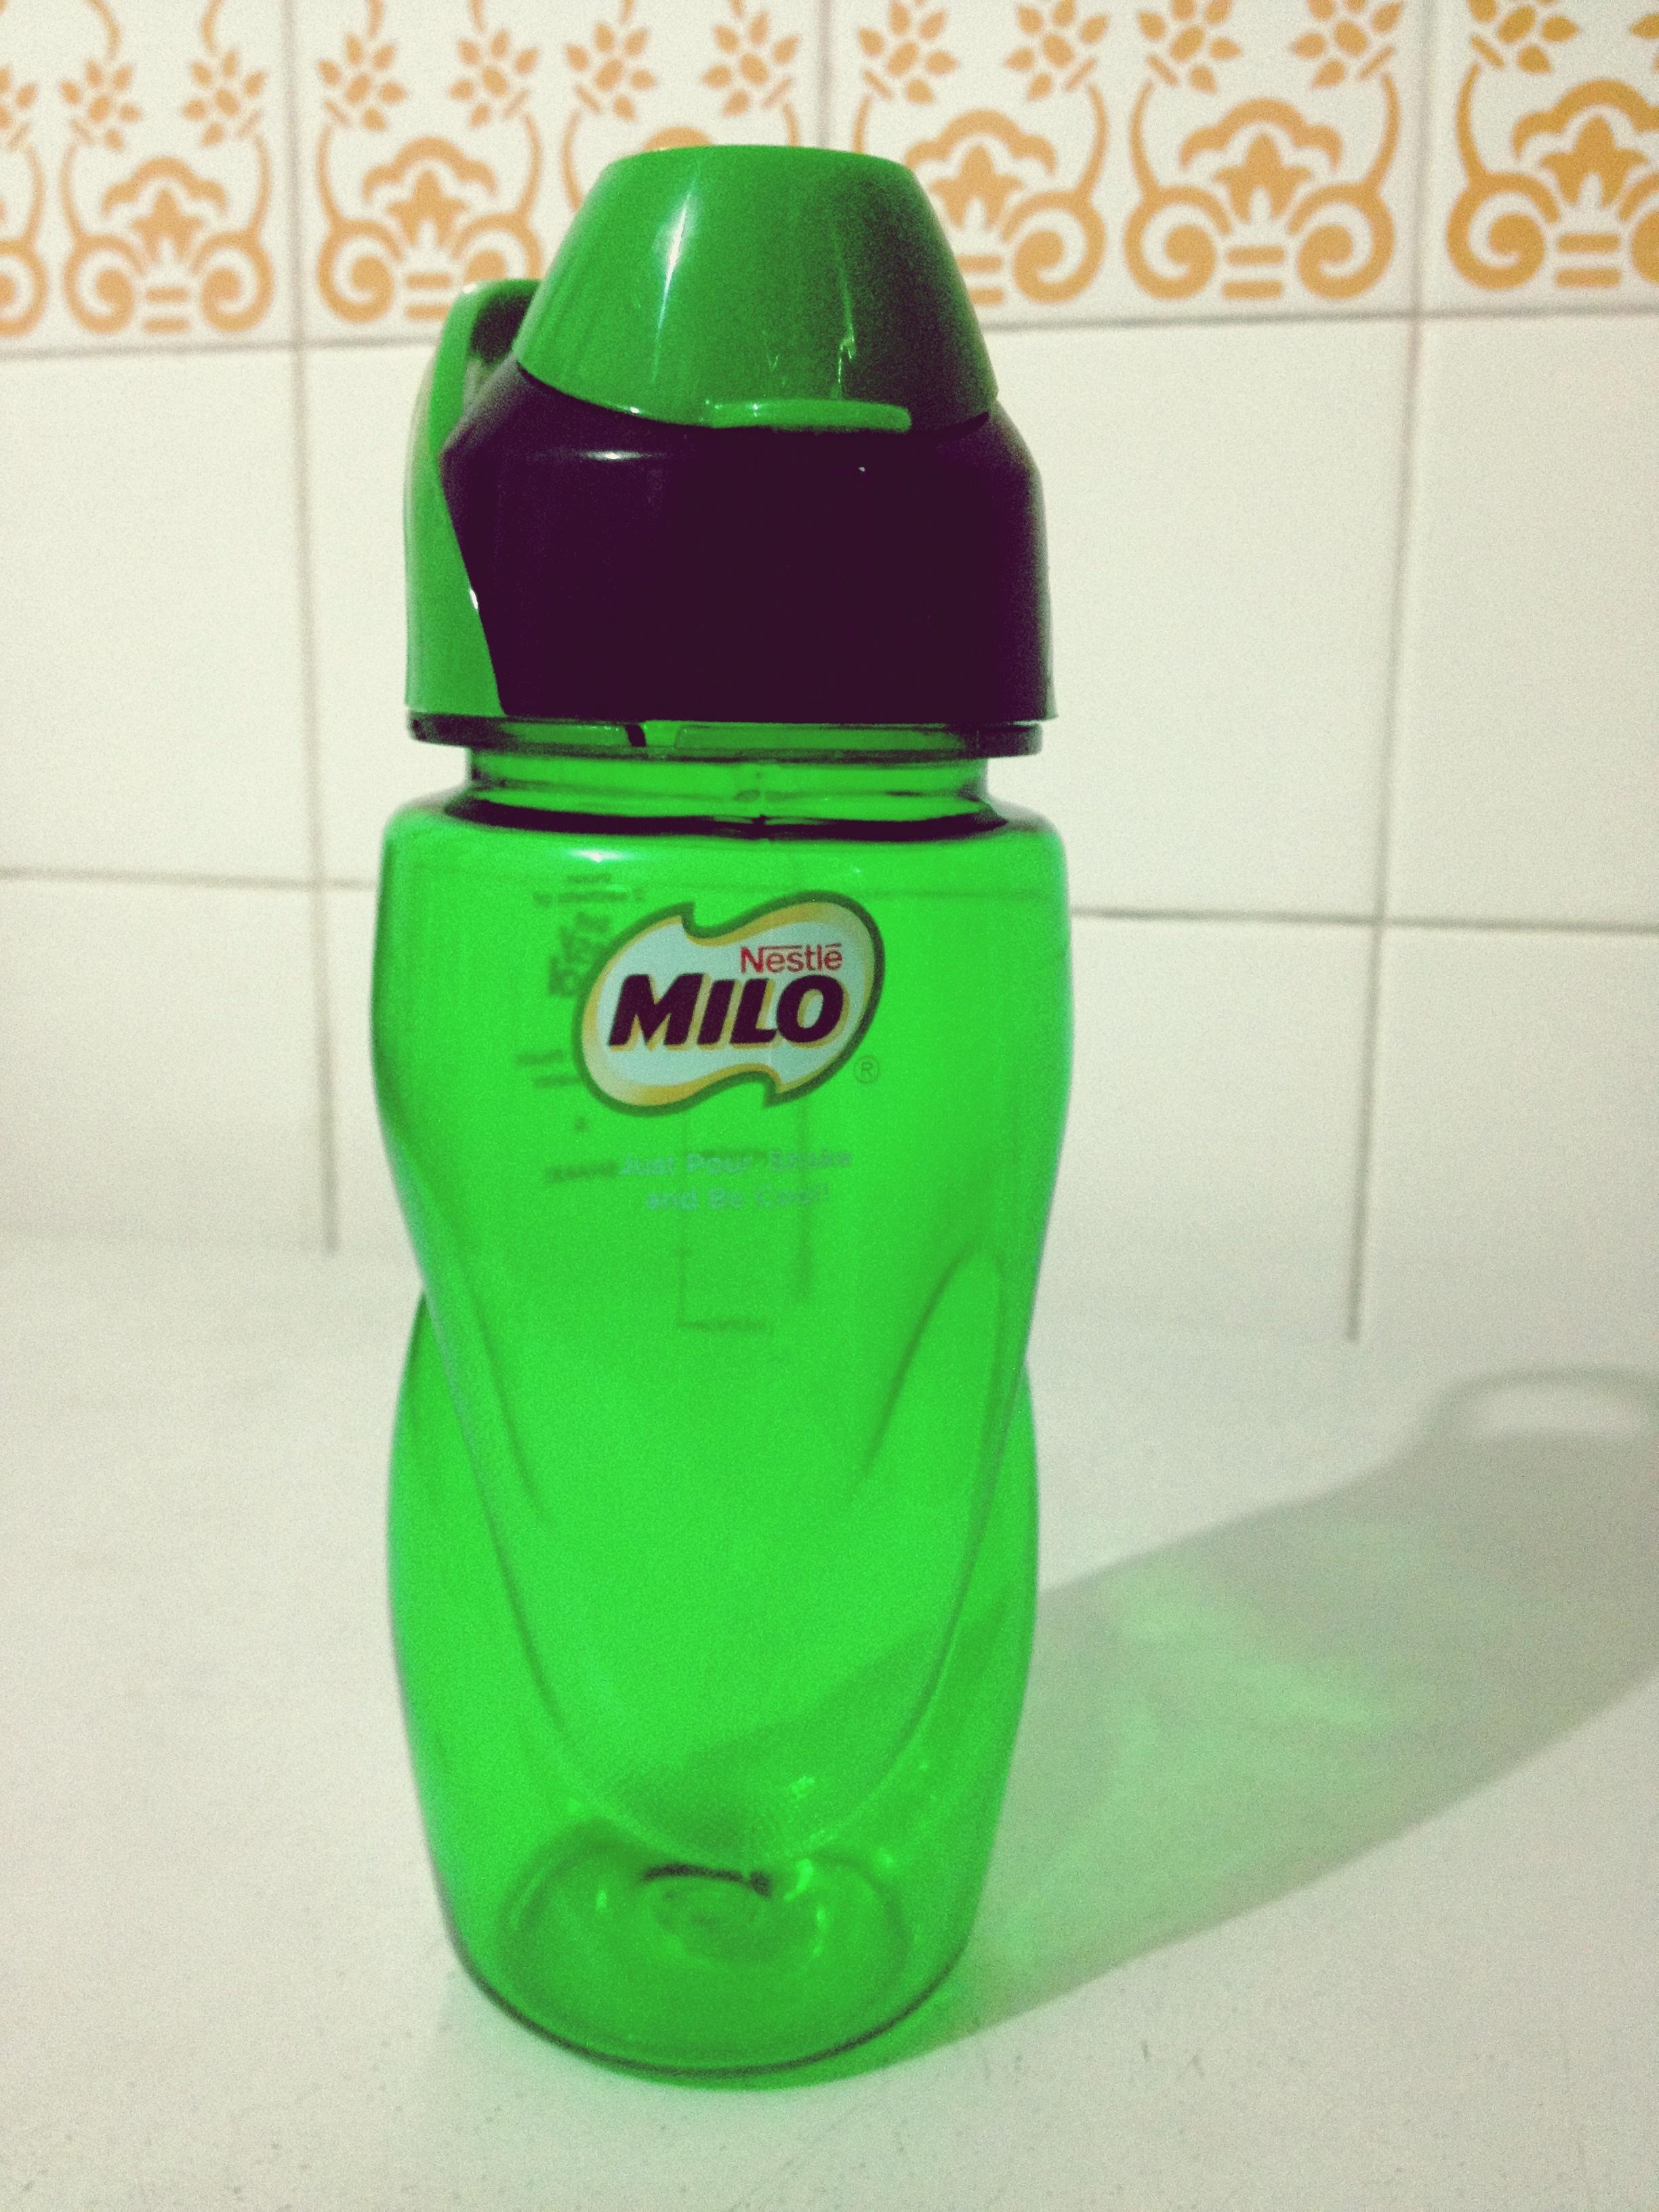 Milo M For Musxzart Sachet Then